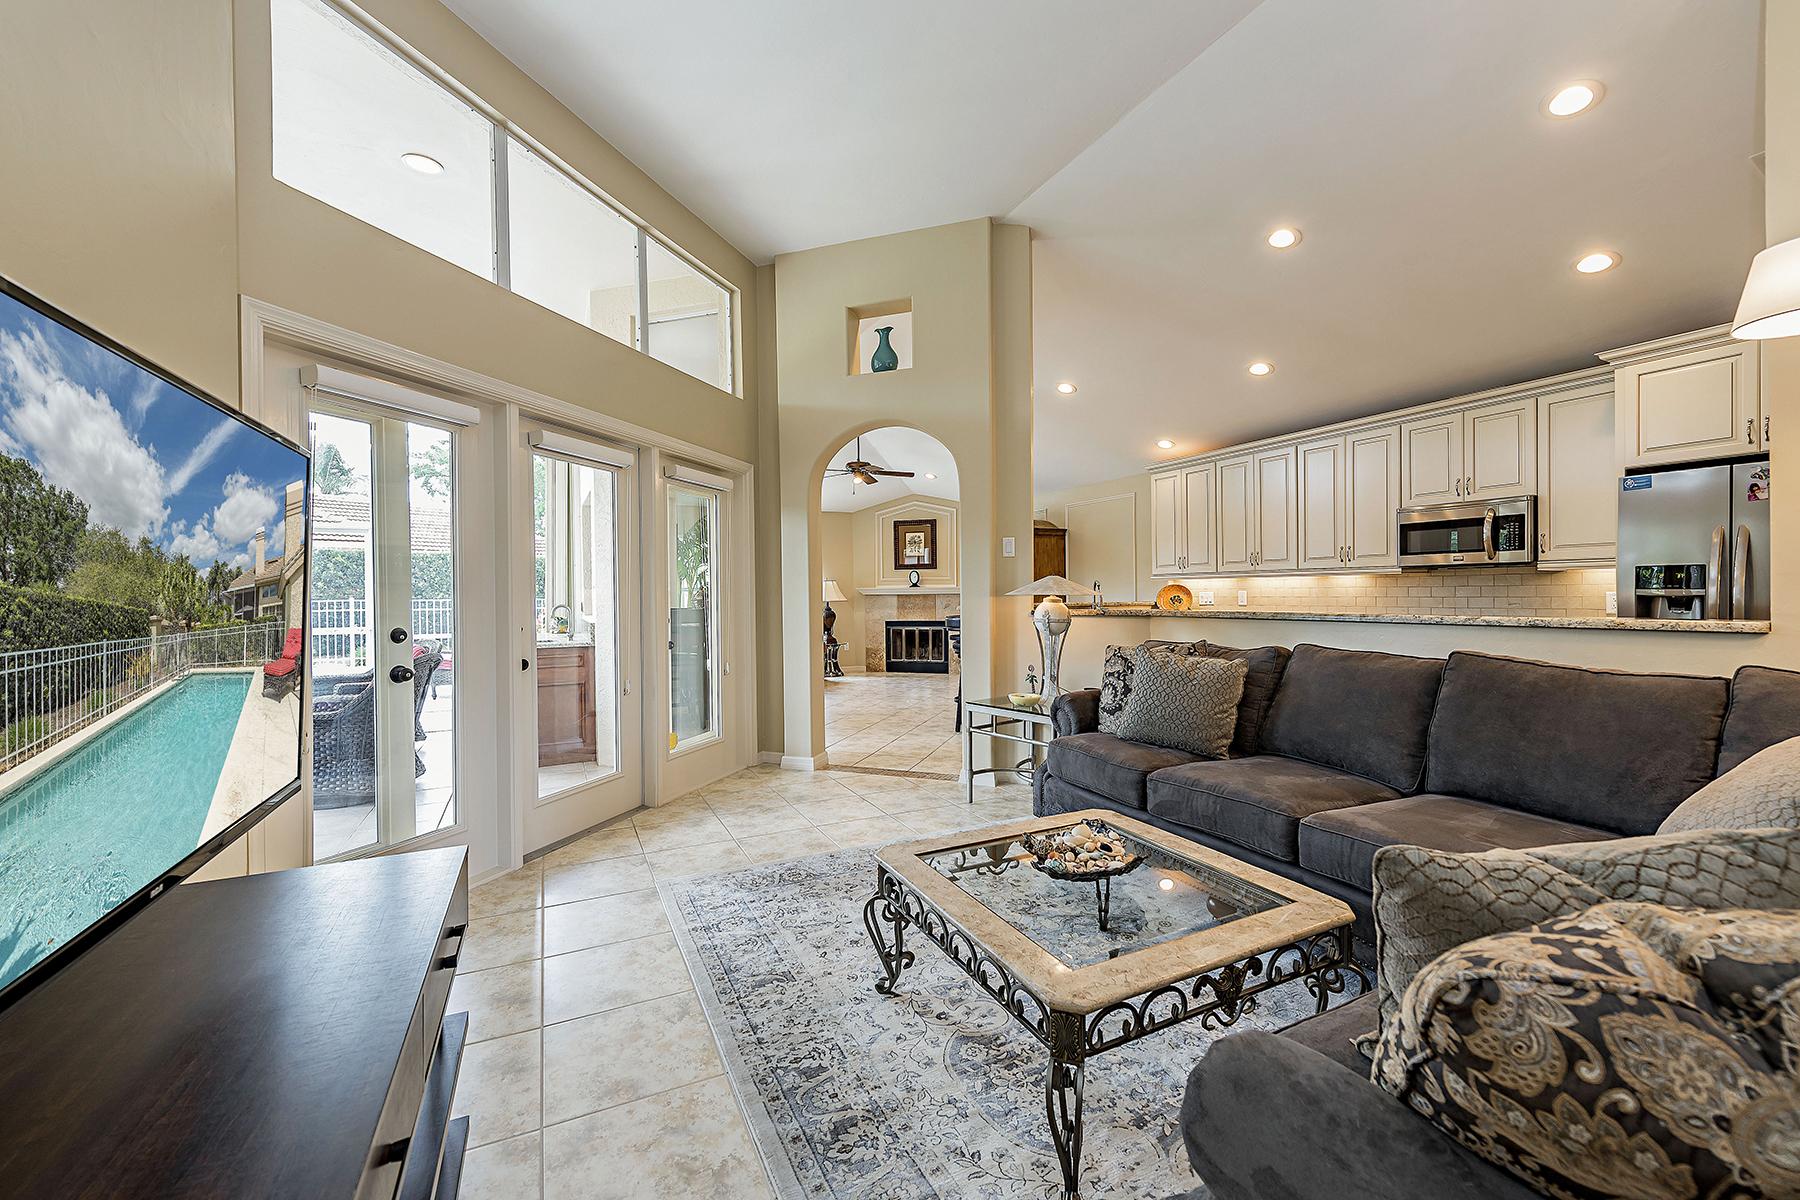 Single Family Home for Sale at QUAIL CREEK VILLAGE 10378 Quail Crown Dr, Naples, Florida 34119 United States